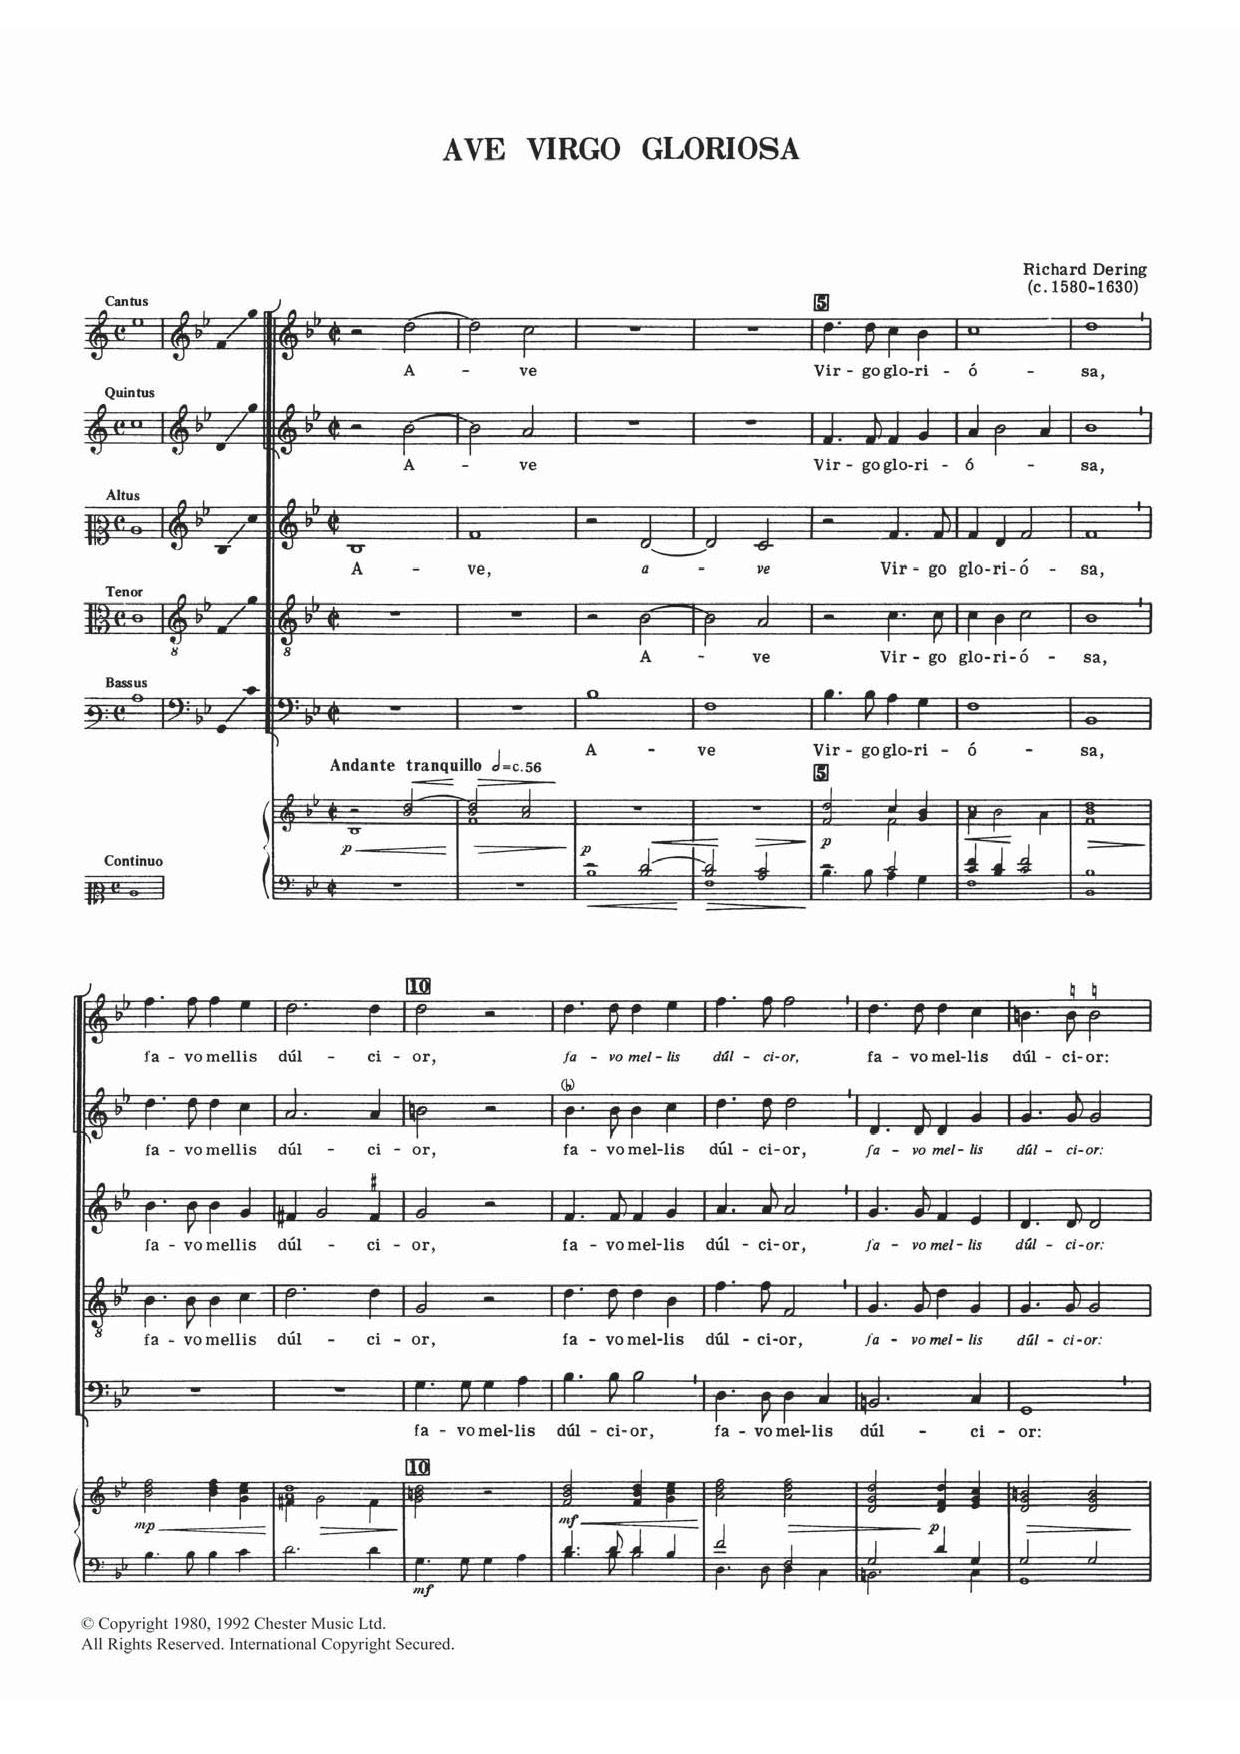 Ave Virgo Gloriosa Sheet Music